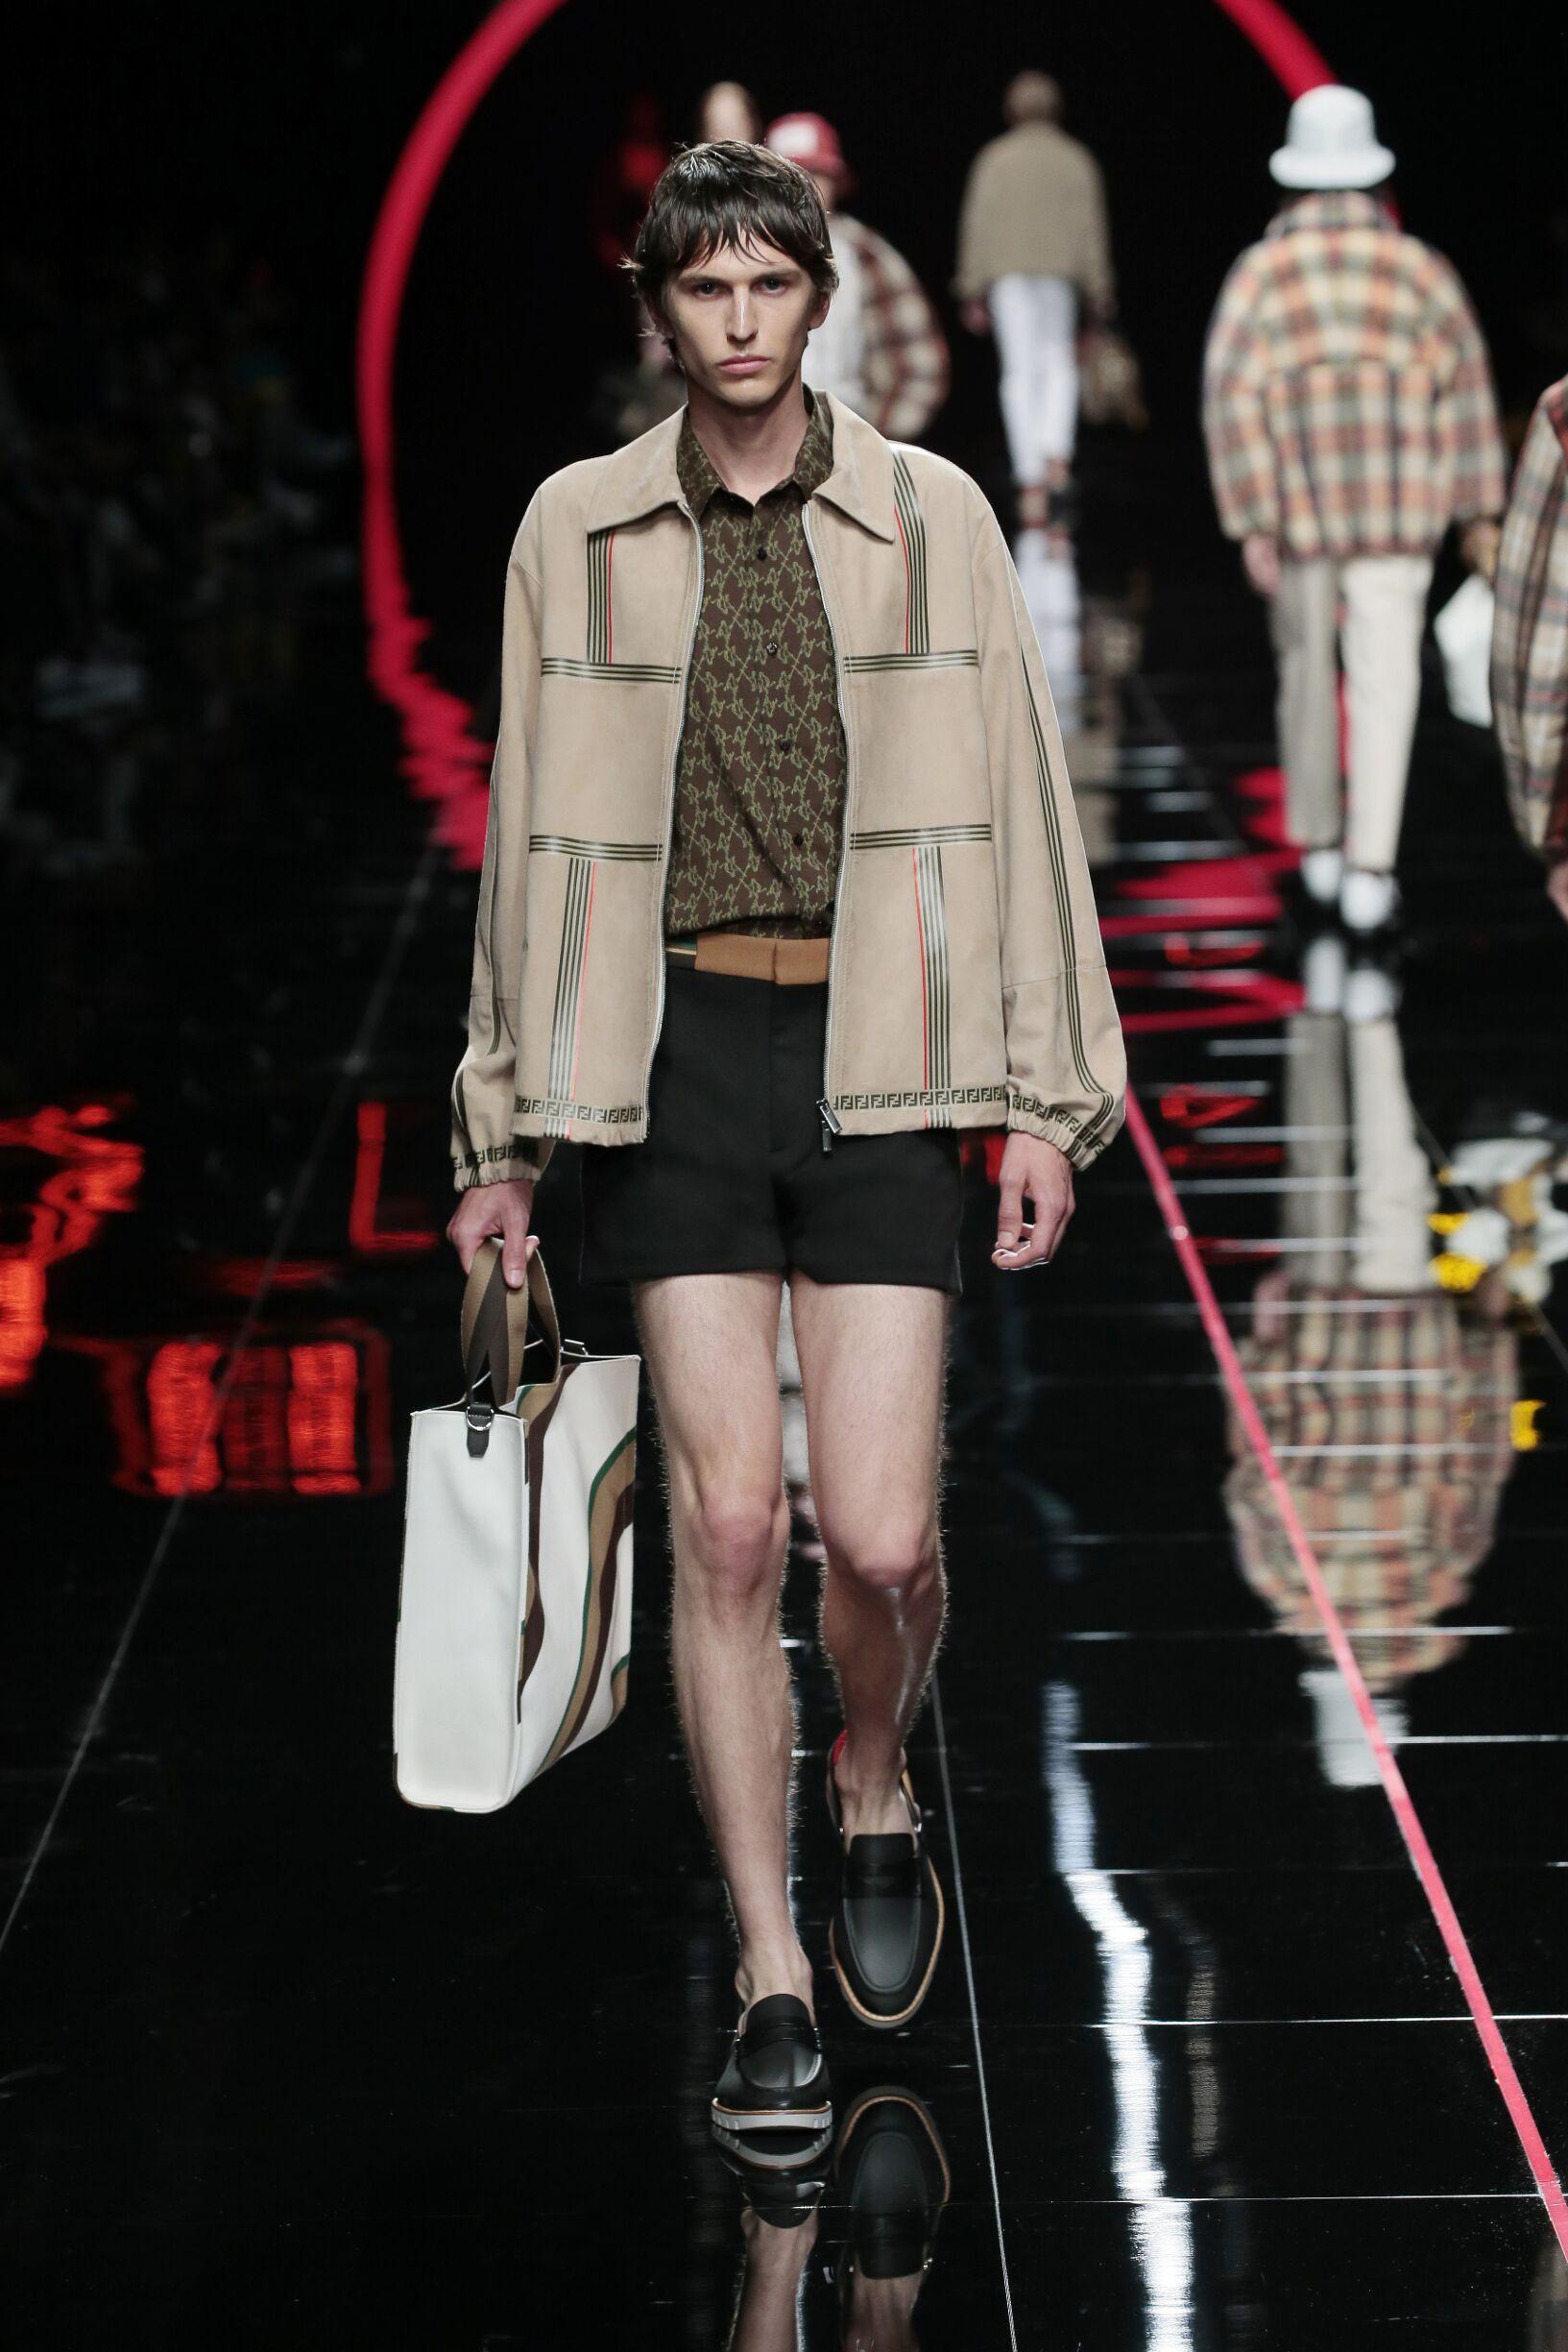 Catwalk Fendi Man Fashion Show Summer 2019